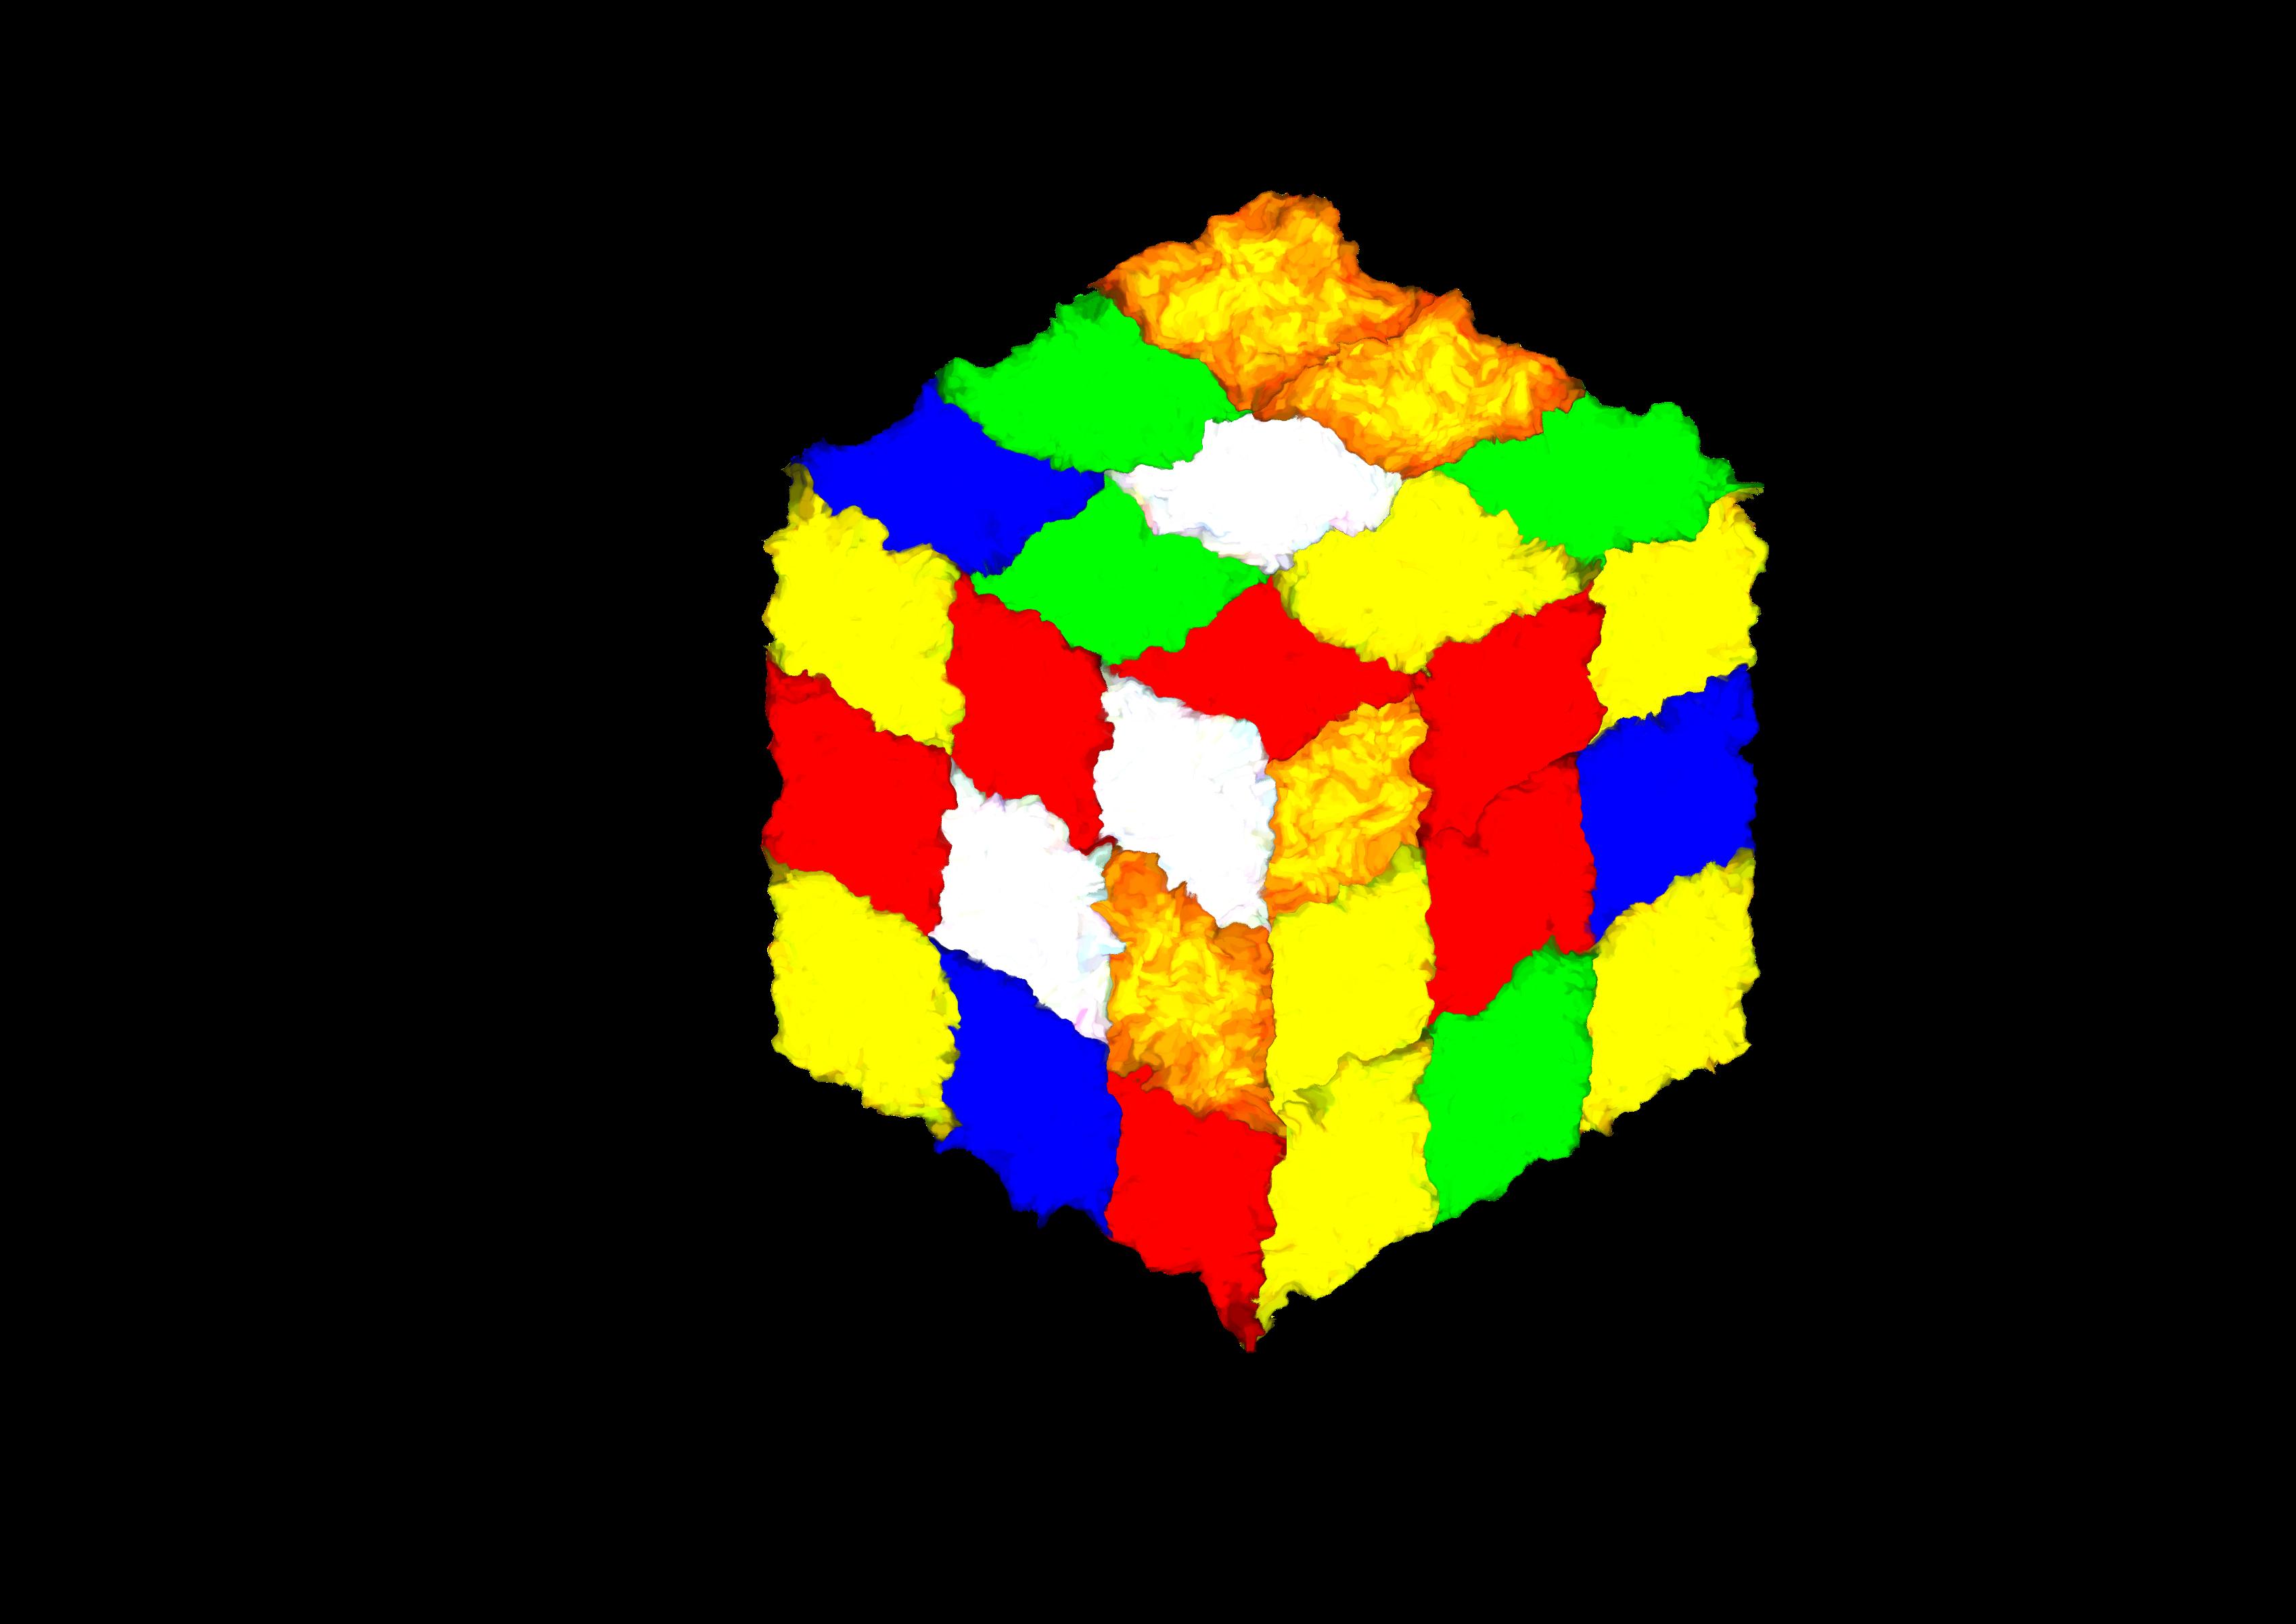 Cube clipart rubik's cube Cube Clipart Rubiks remix cube